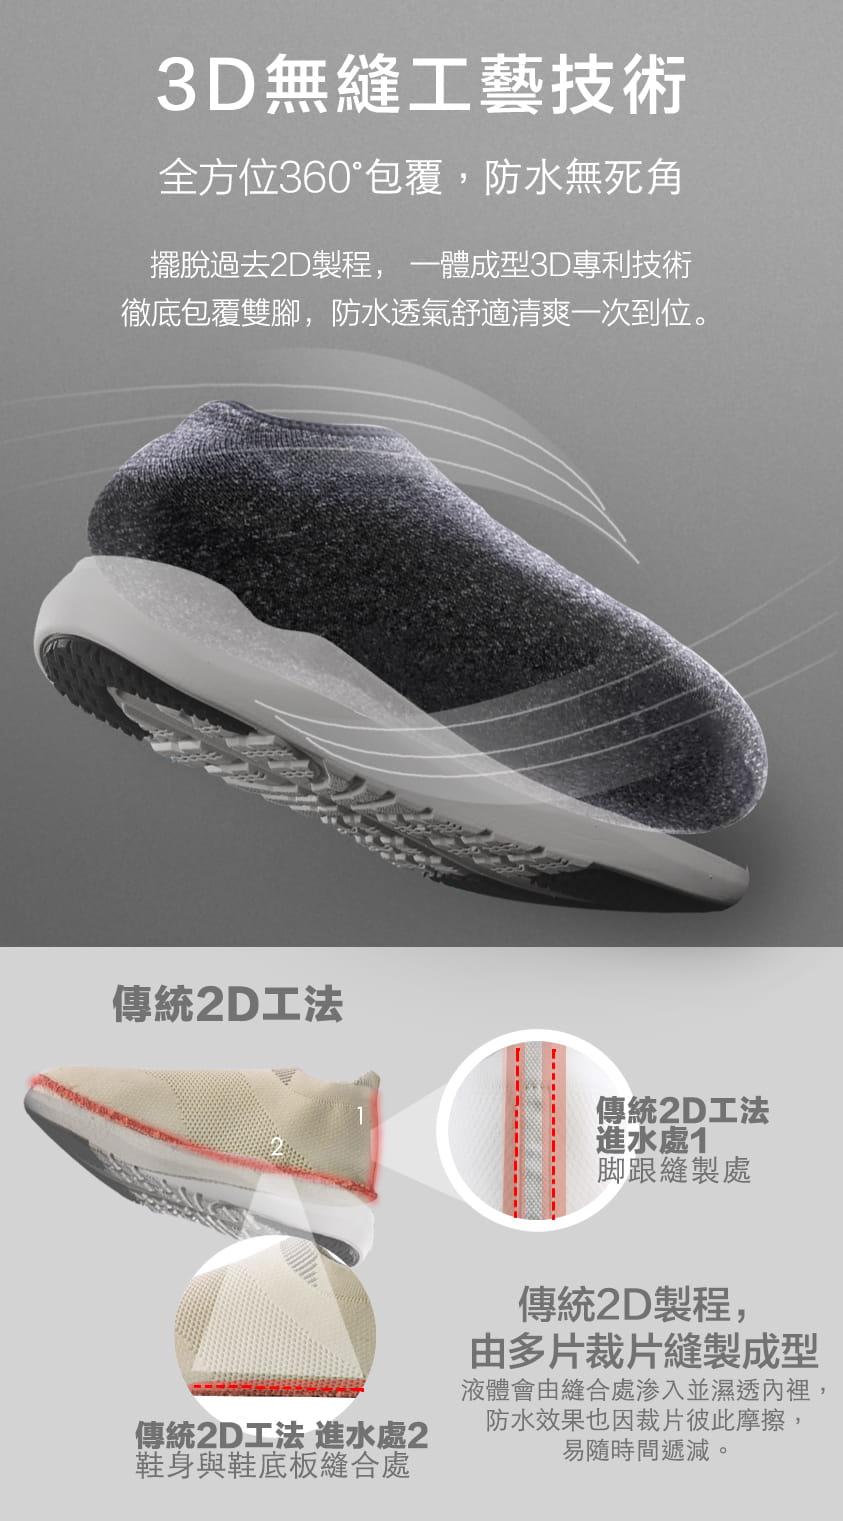 【V-TEX 地表最強防水鞋】【V-TEX機能防水鞋】 雙11優選款式 (3款任選) 10